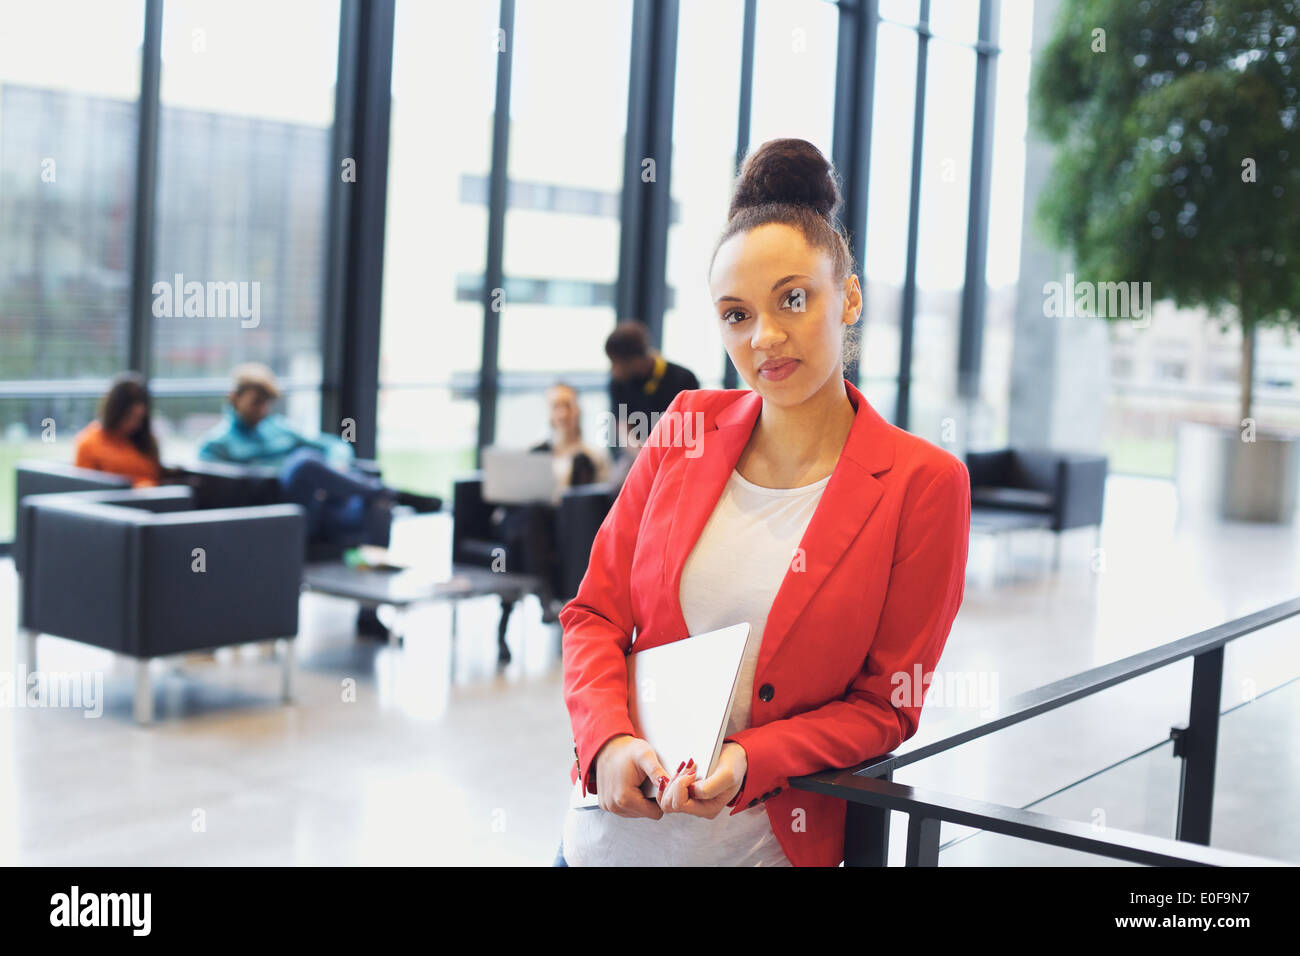 Certains jeunes afro american woman holding article par une rambarde regardant la caméra. Young businesswoman in office. Photo Stock